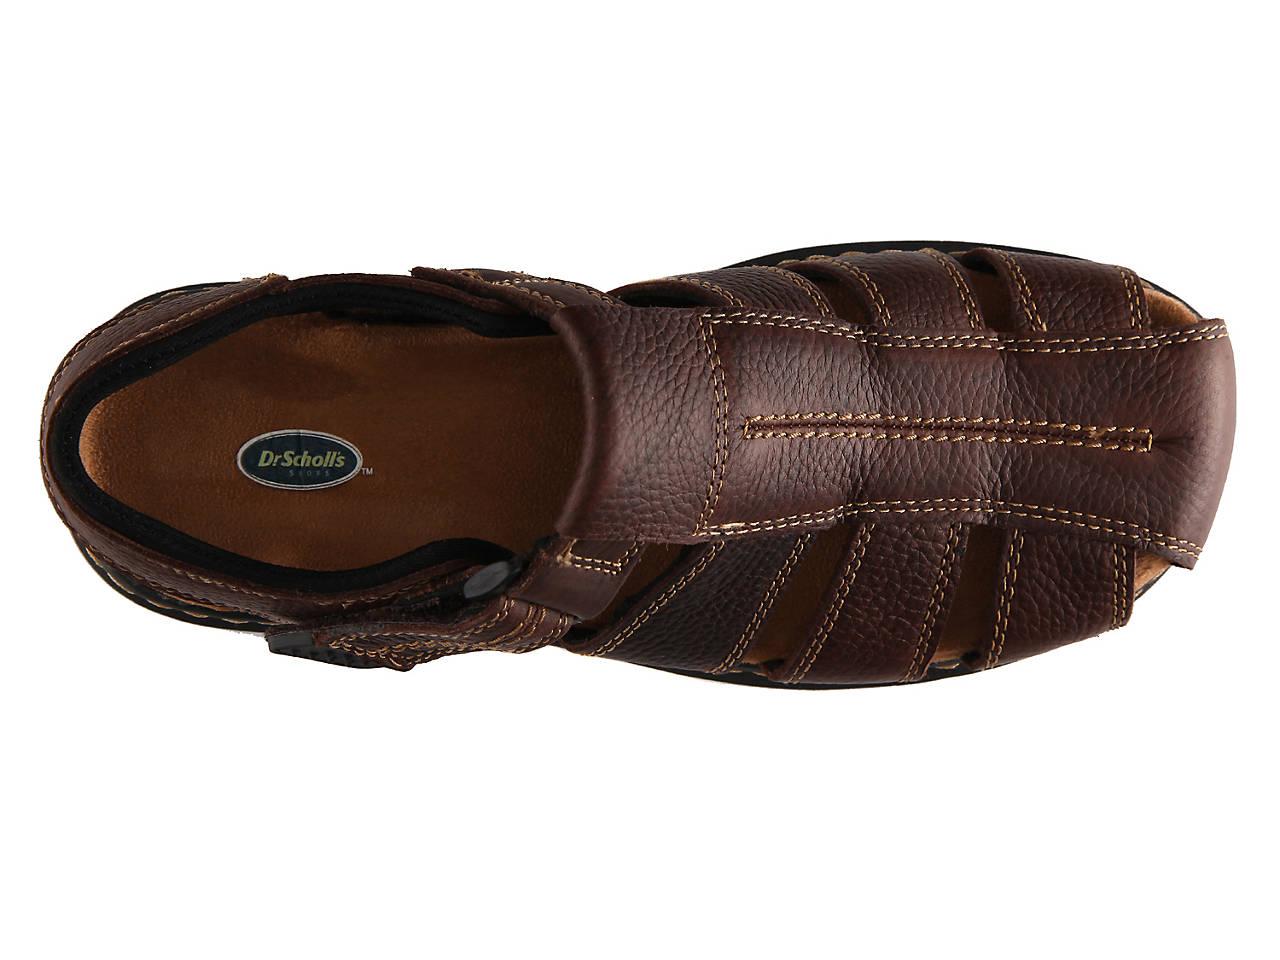 c23f280b7672 Dr. Scholl s Gaston Fisherman Sandal Men s Shoes